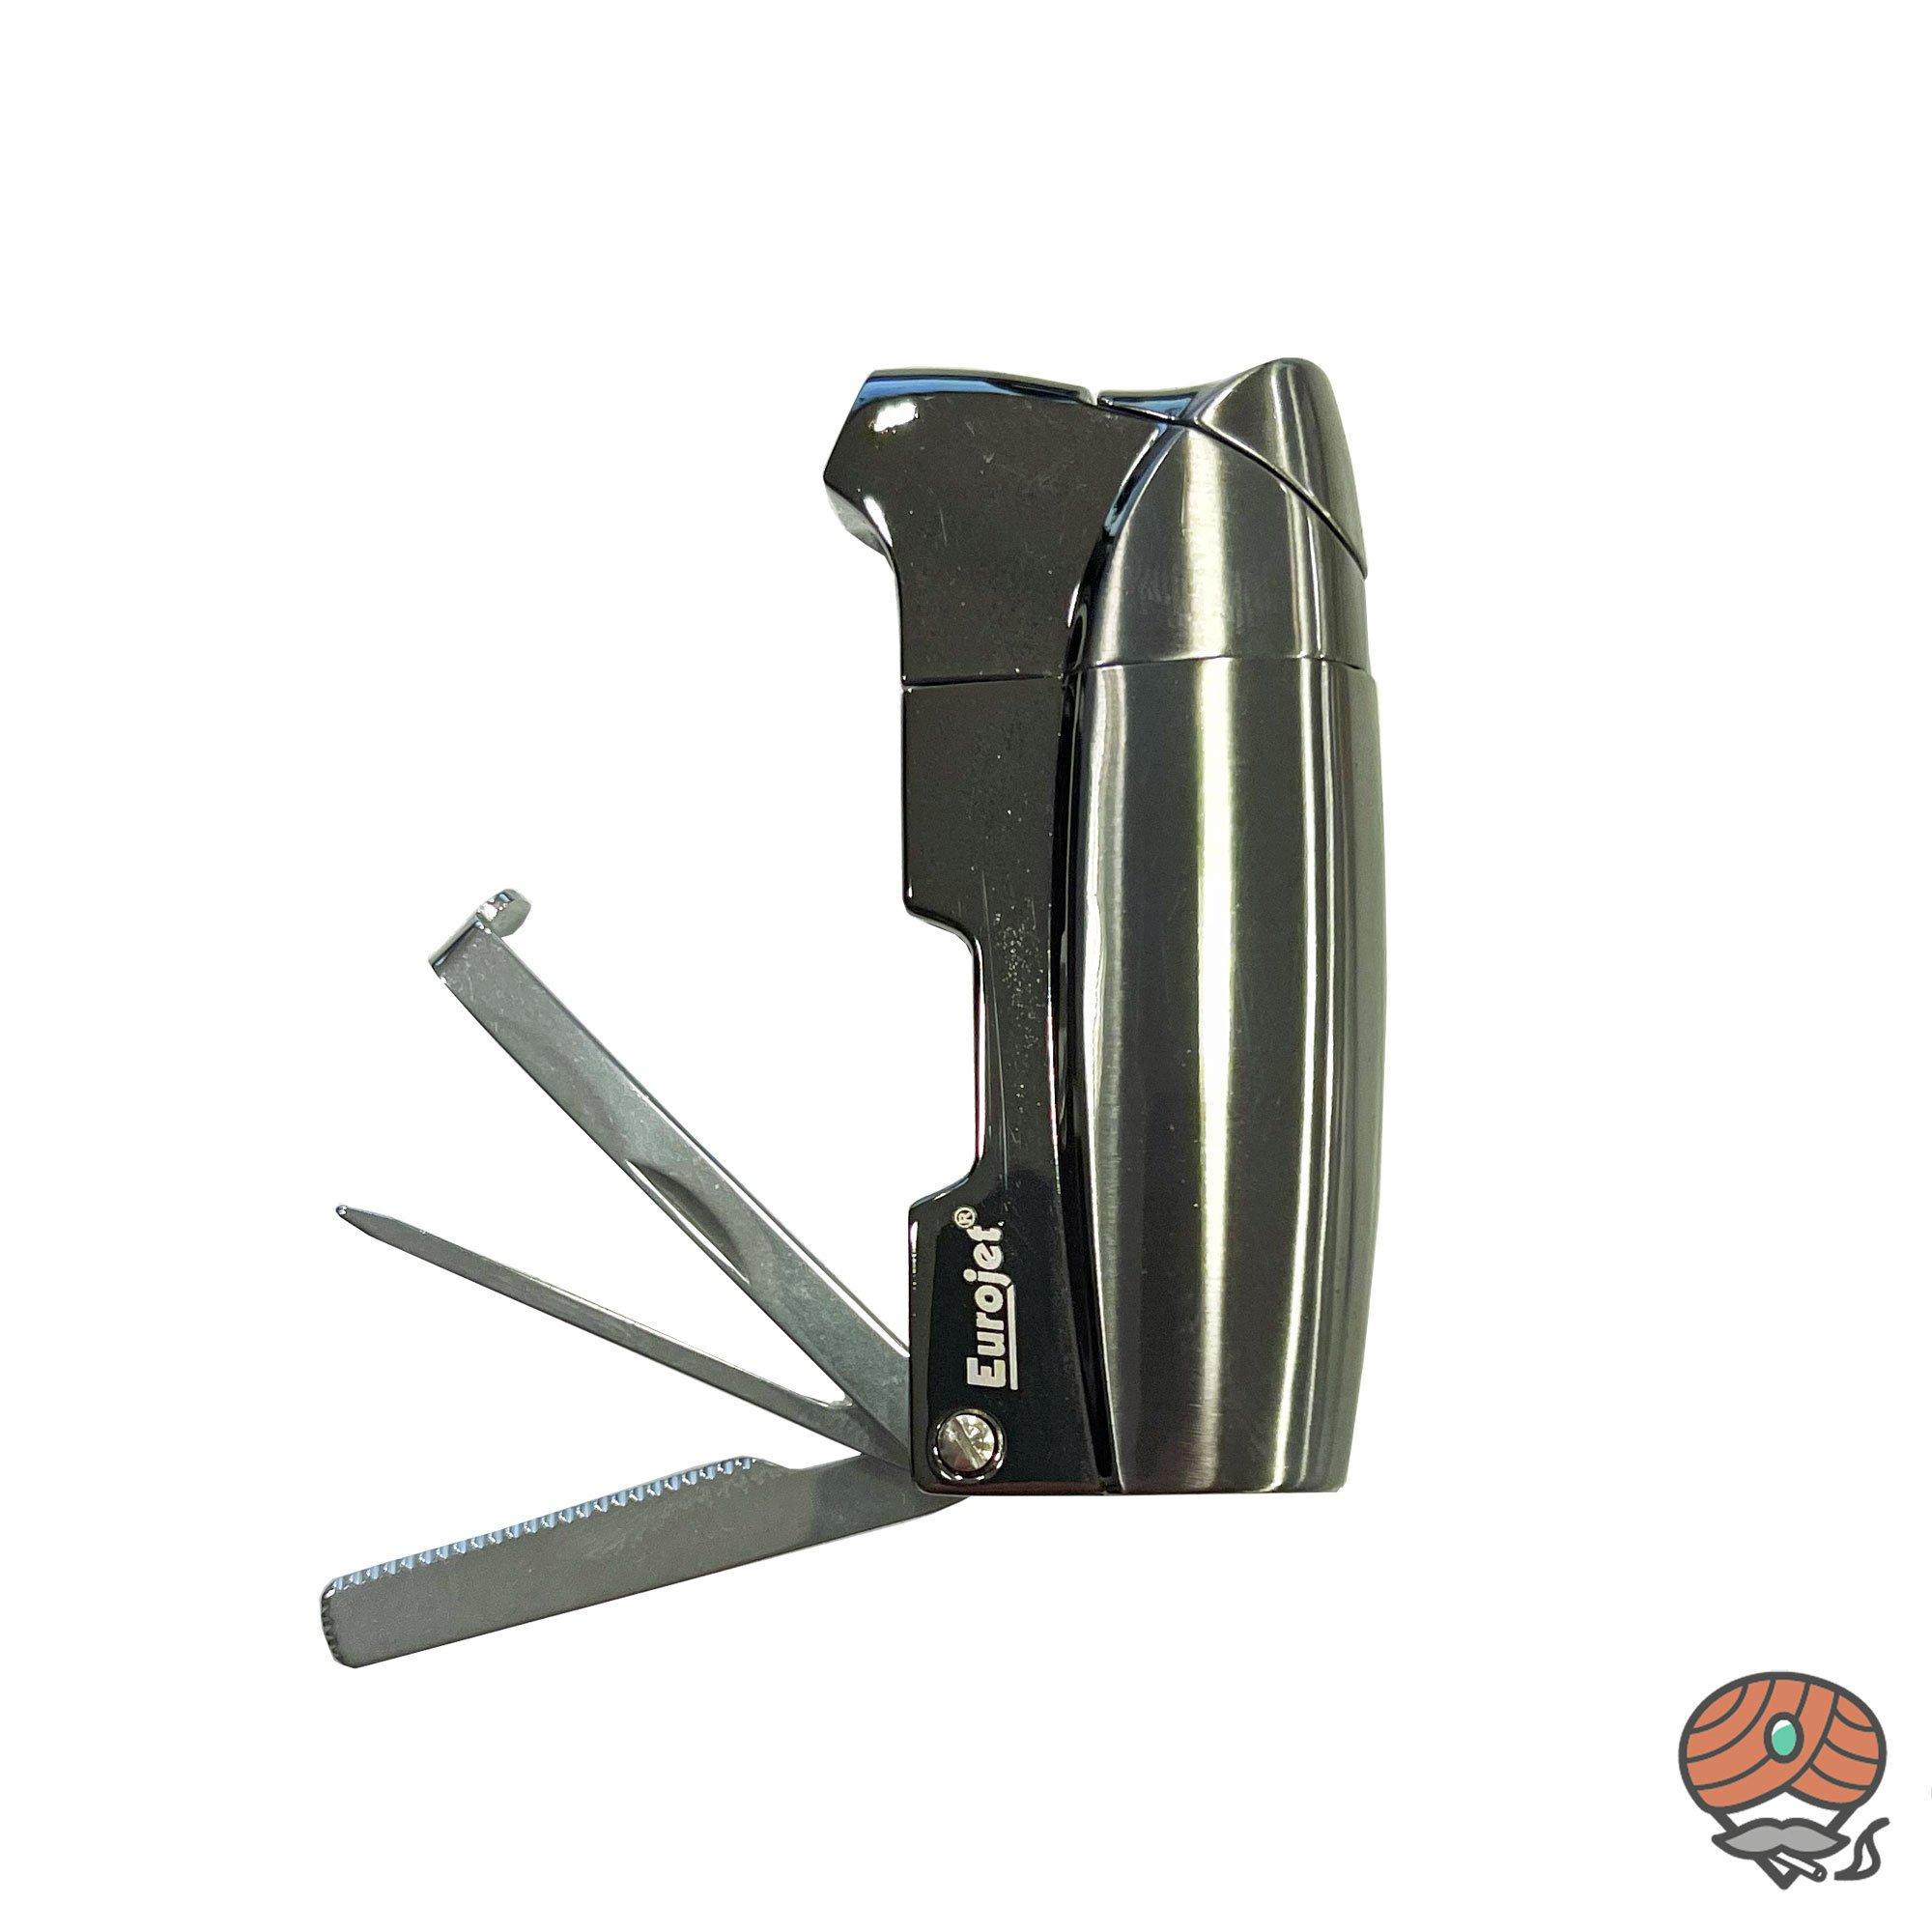 Eurojet Metall-Pfeifenfeuerzeug Soft-Flamme, mit Pfeifenbesteck, Anthrazit